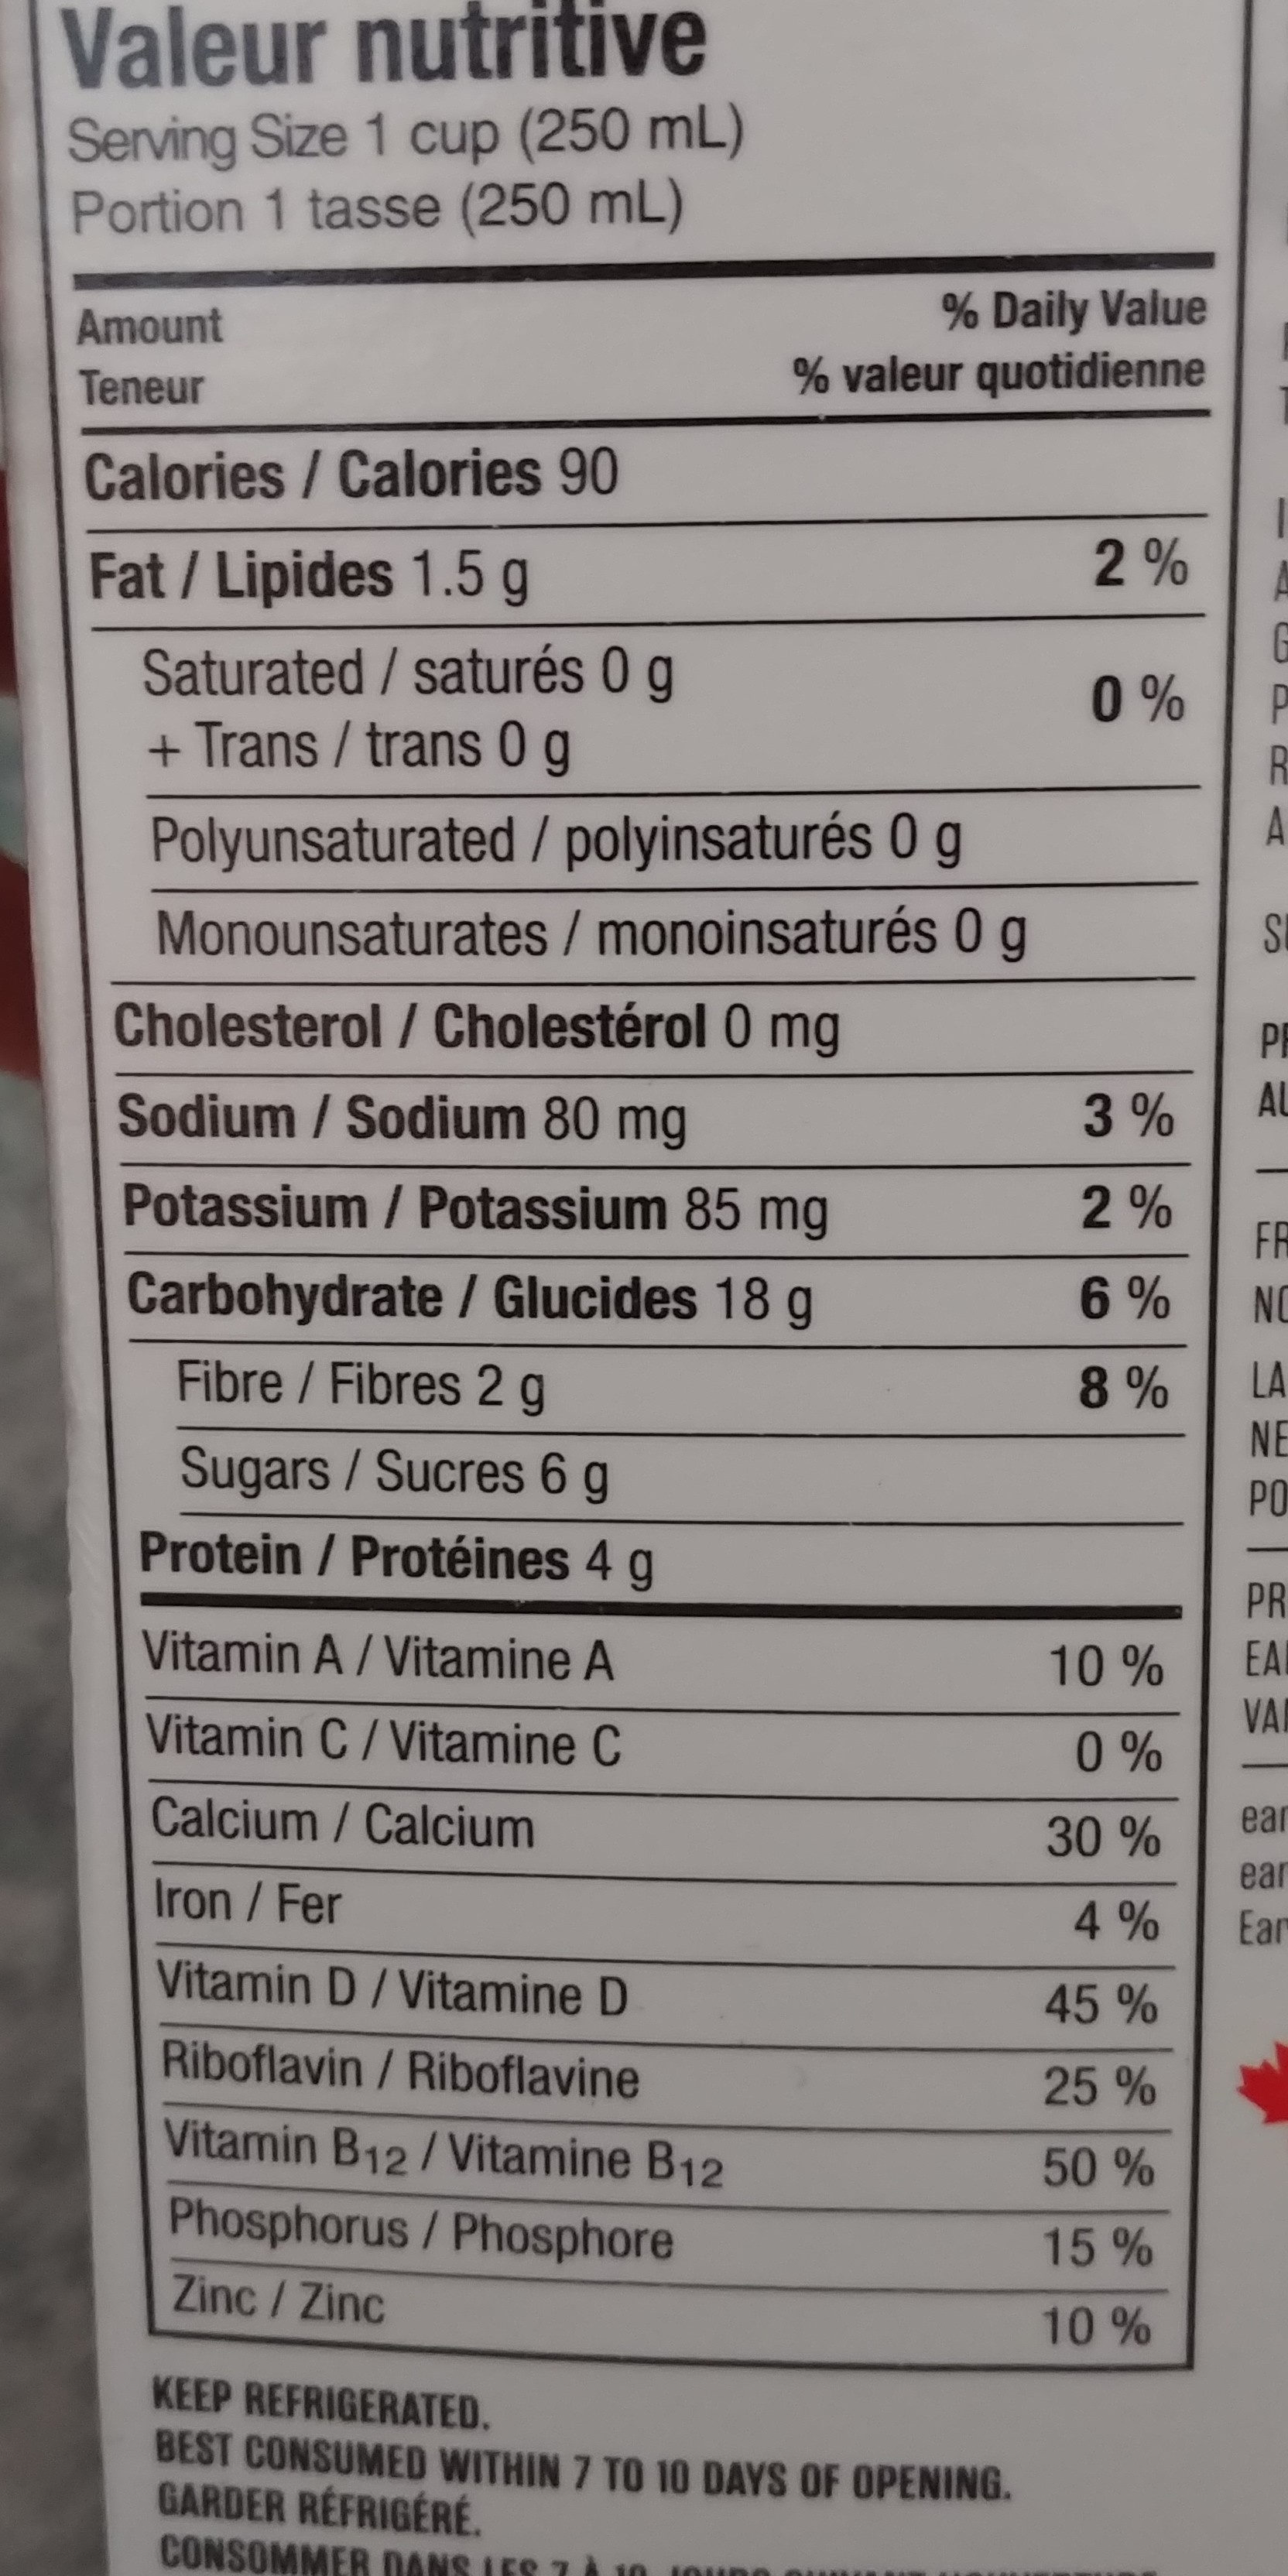 So Fresh AVOINE Vanille non sucrée Sans gluten - Nutrition facts - fr